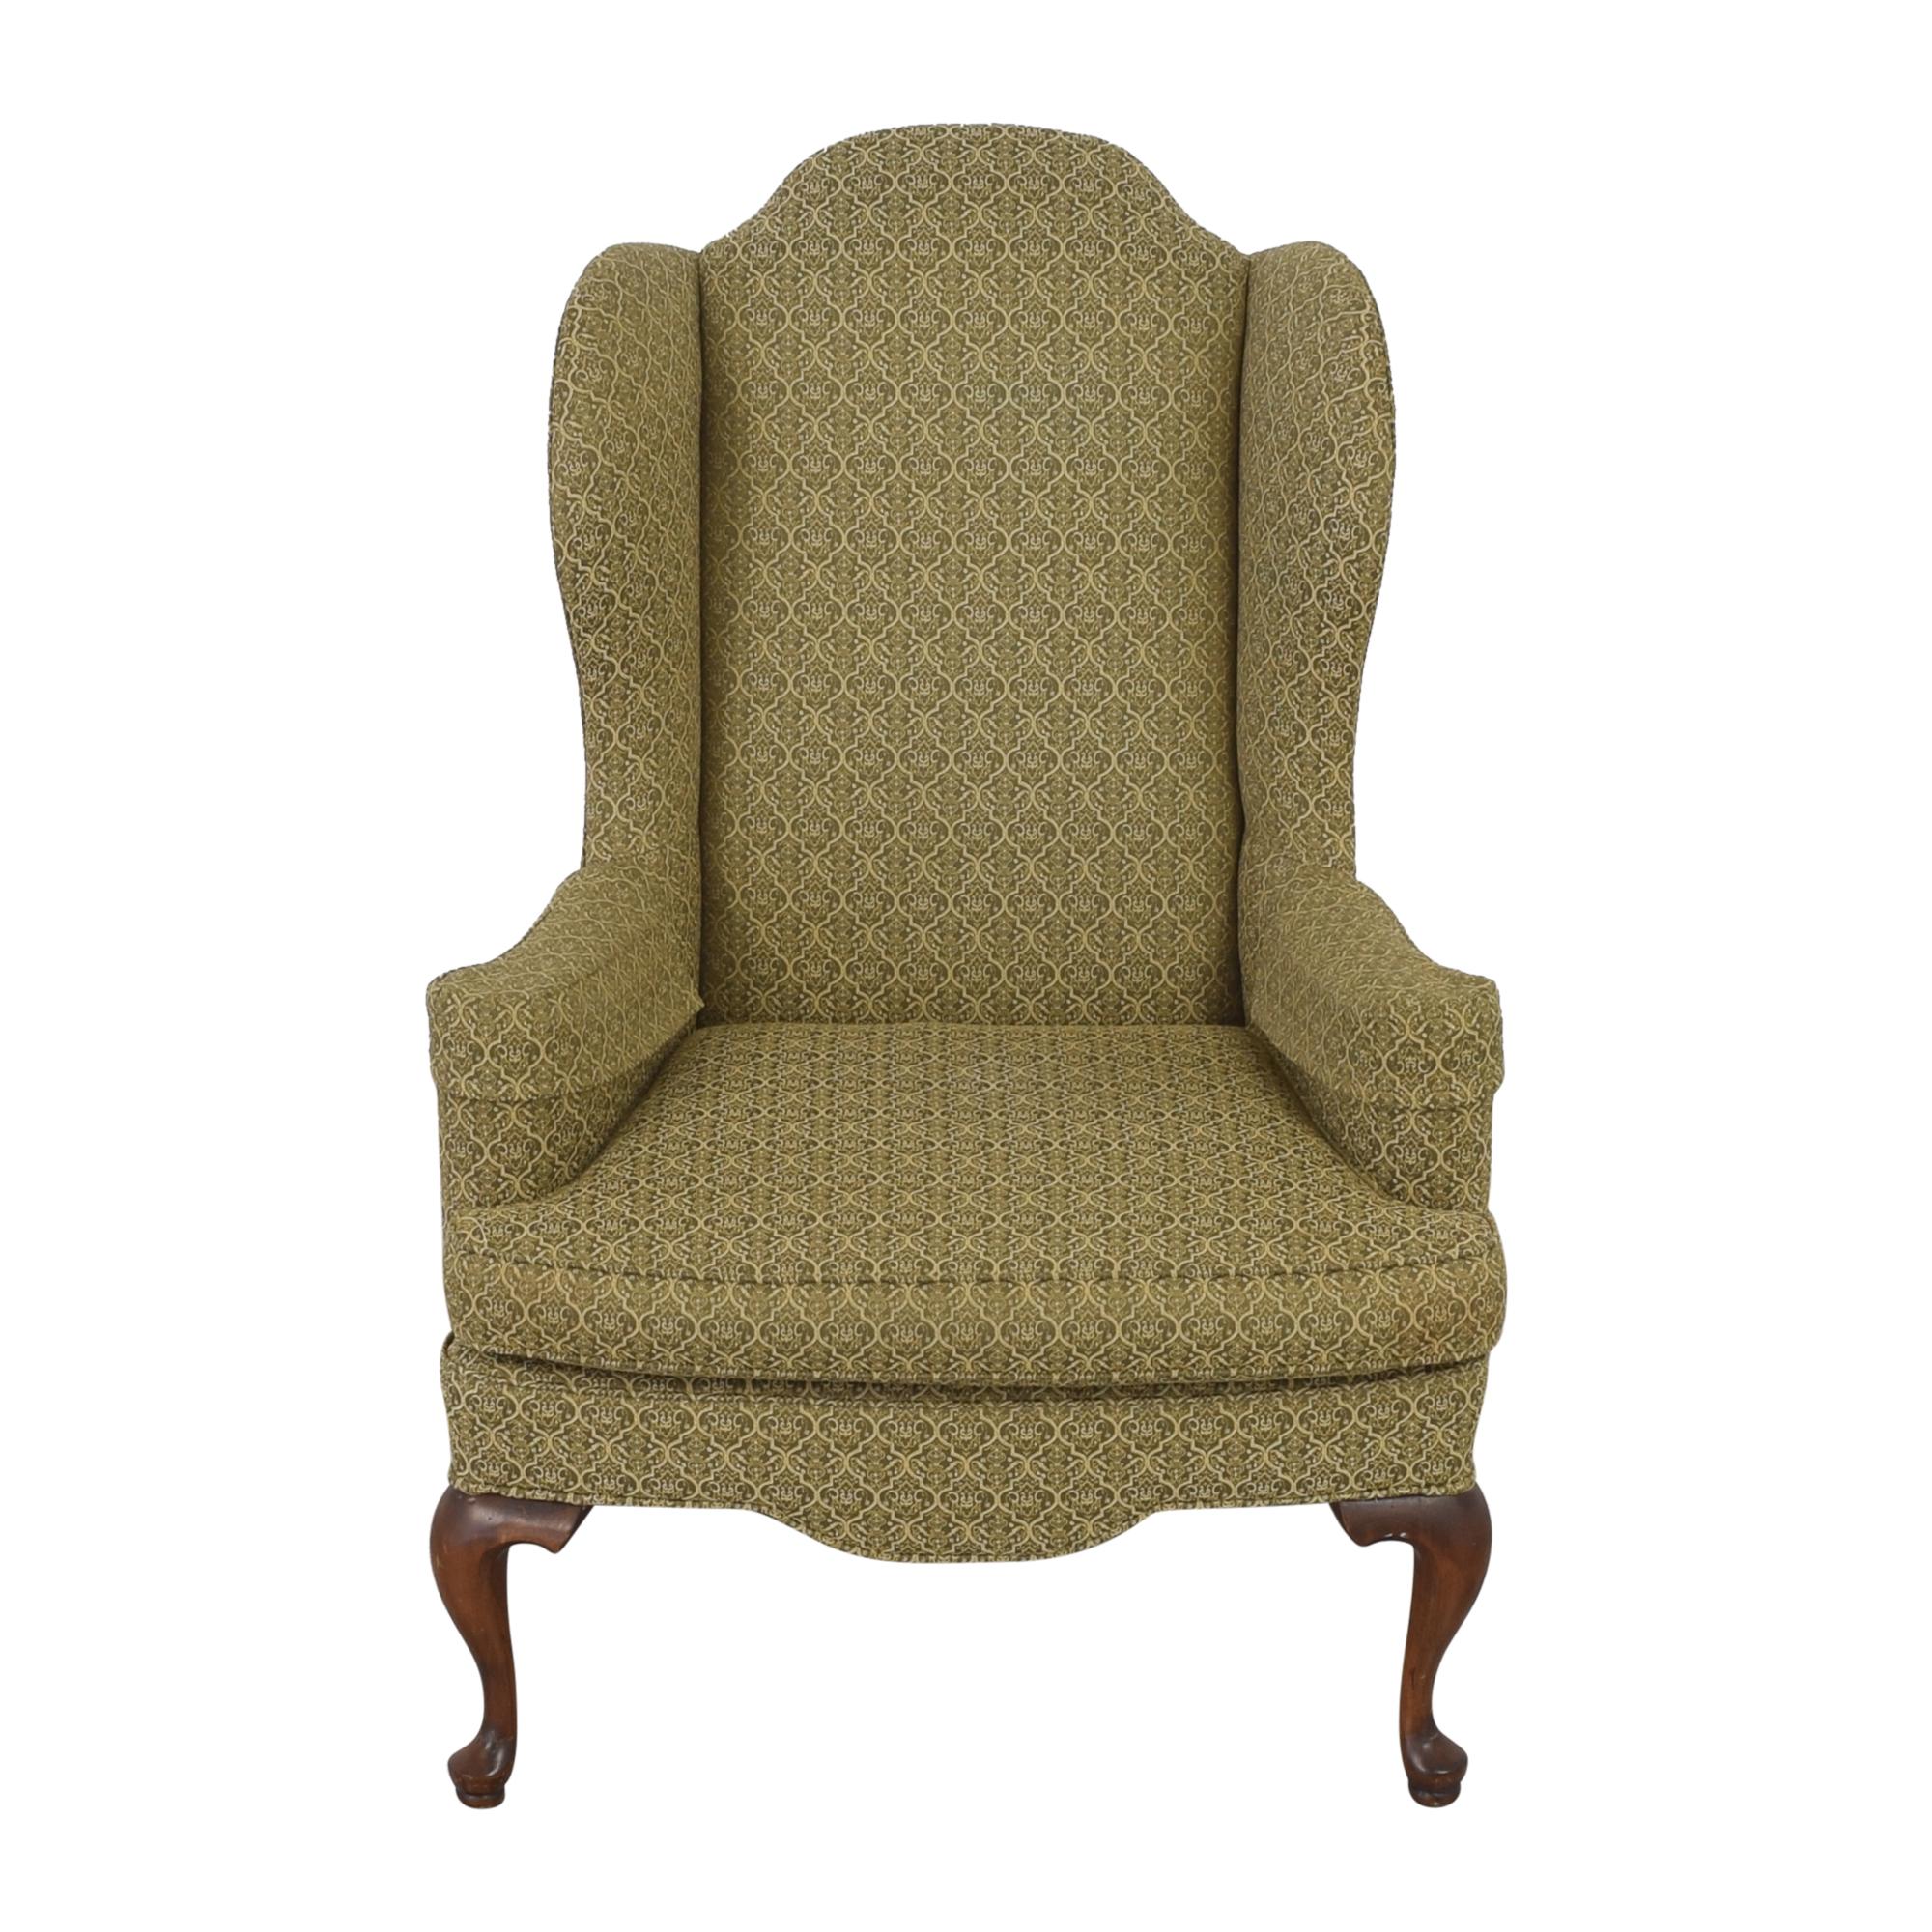 Ethan Allen Ethan Allen Queen Anne Wing Chair dimensions